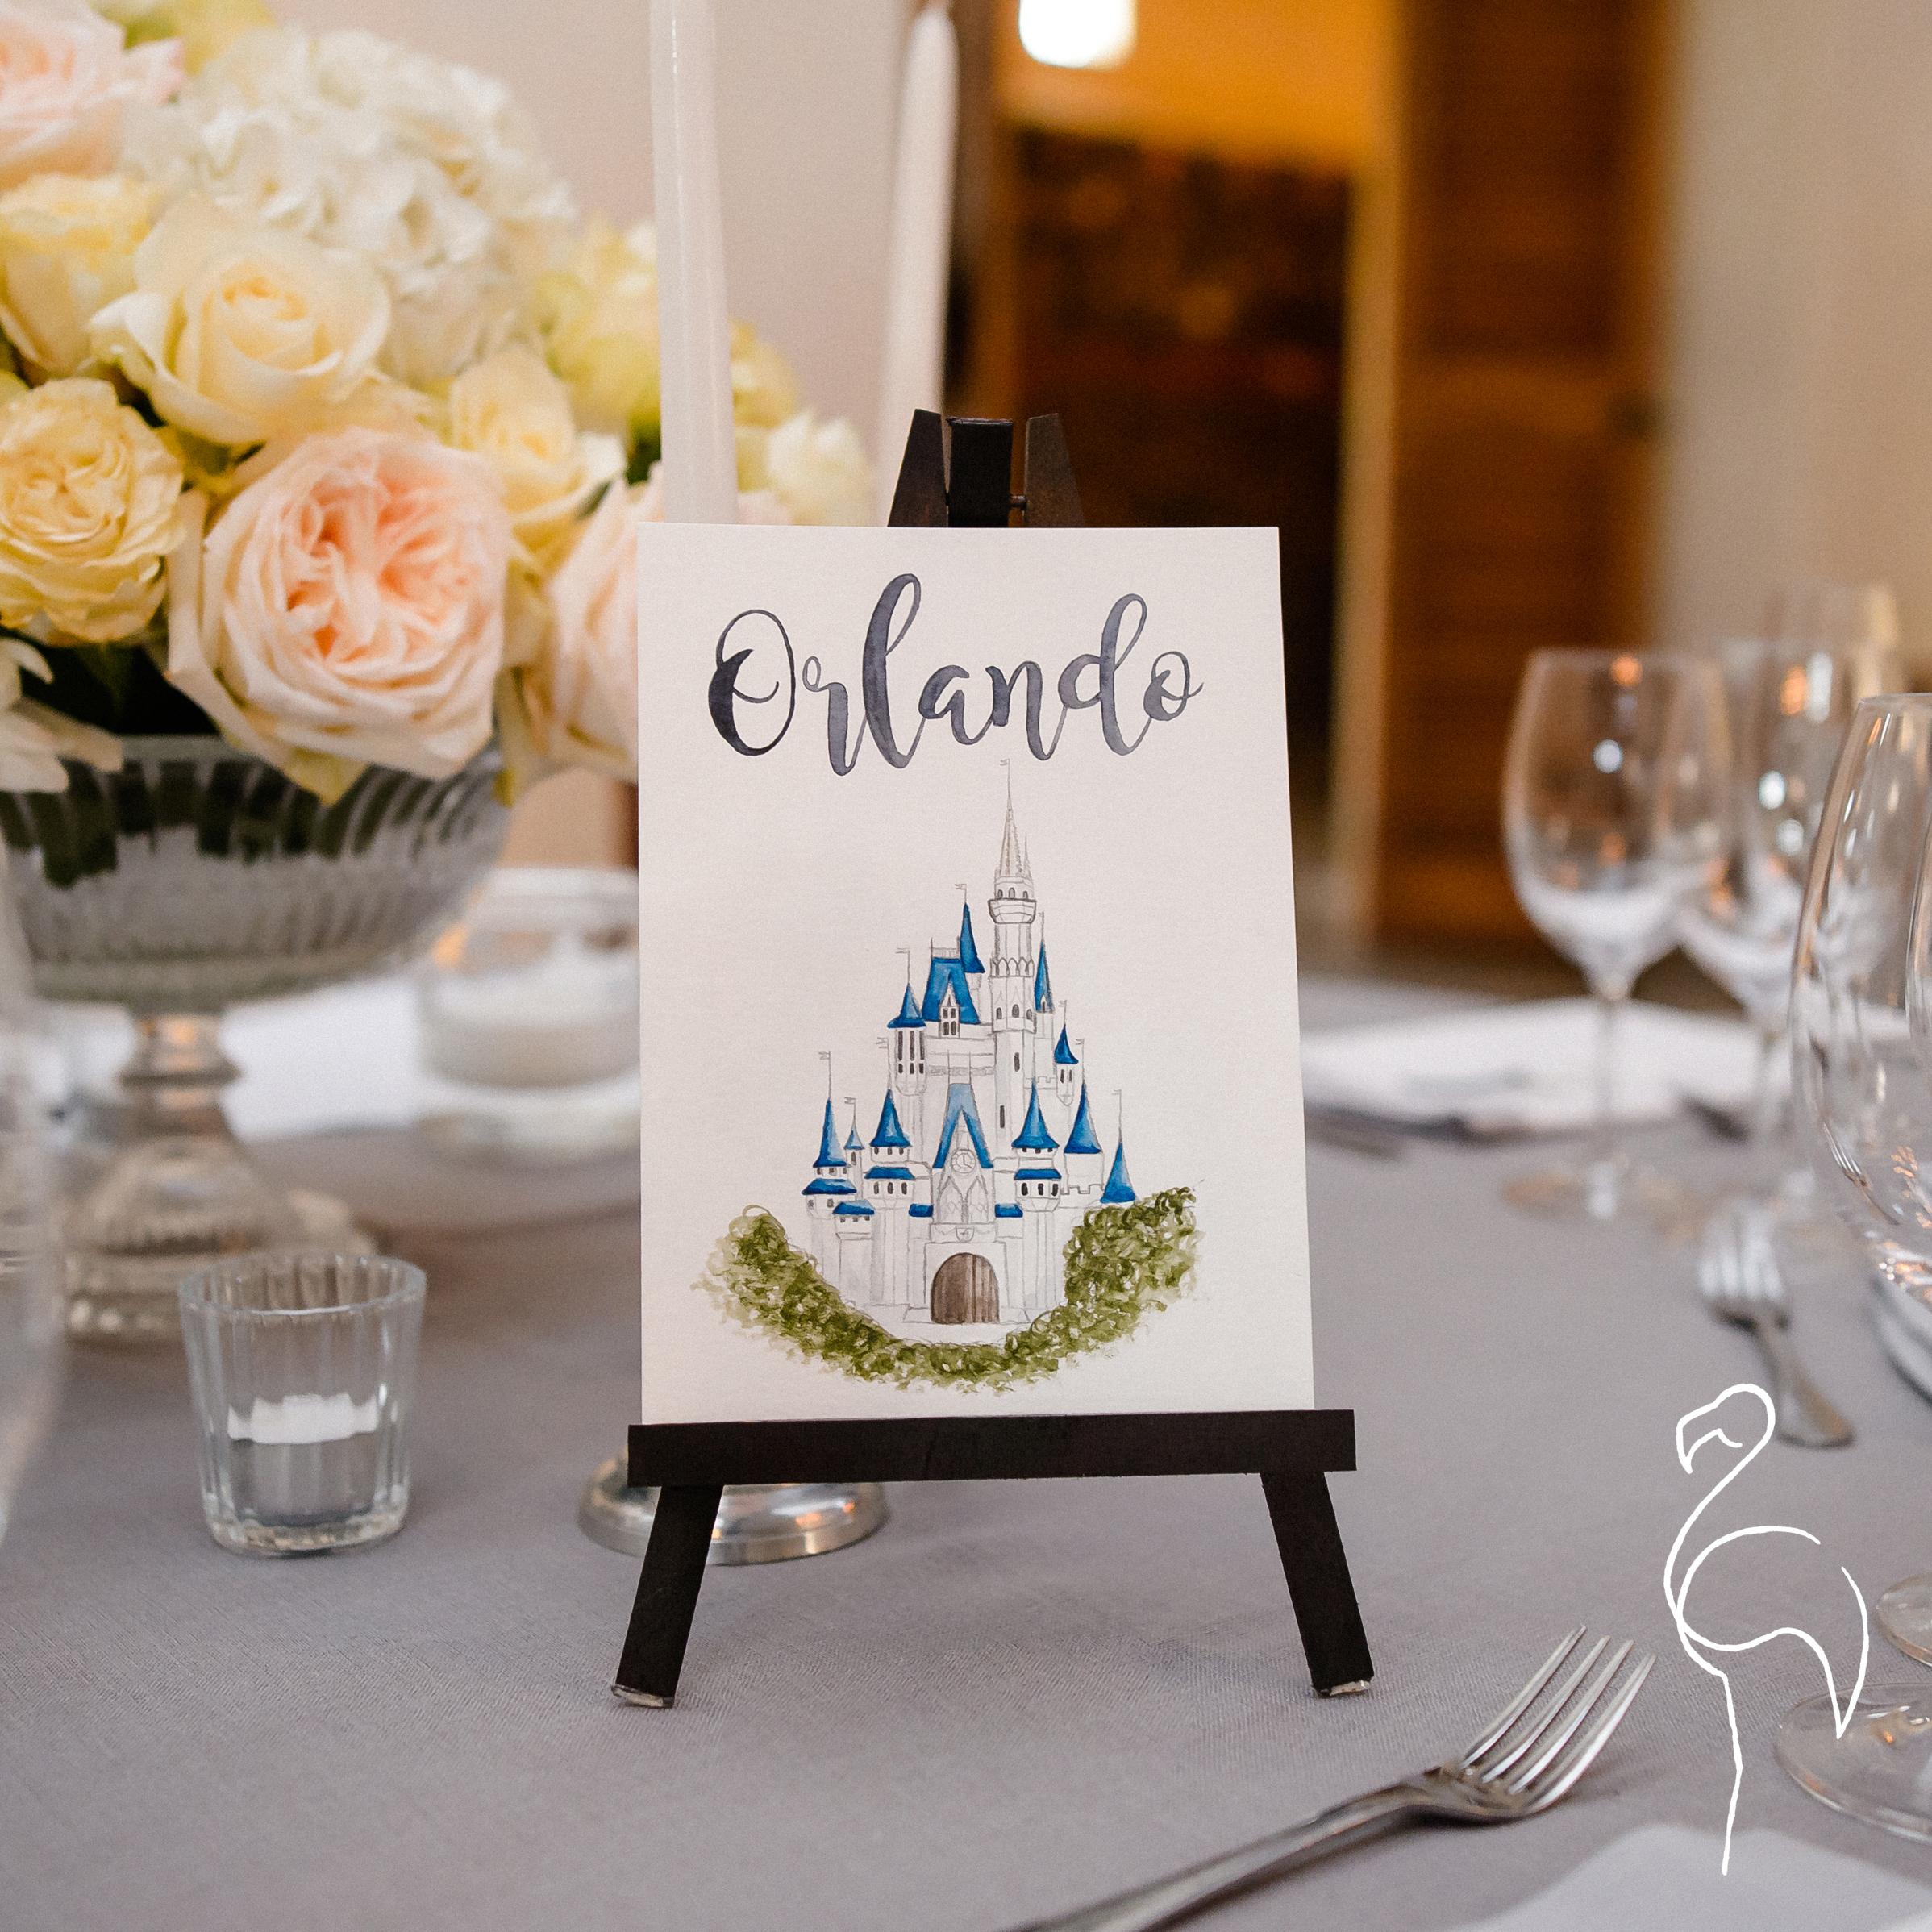 Brazzlebird - Wedding Table Sign Orlando Disney Castle.jpg